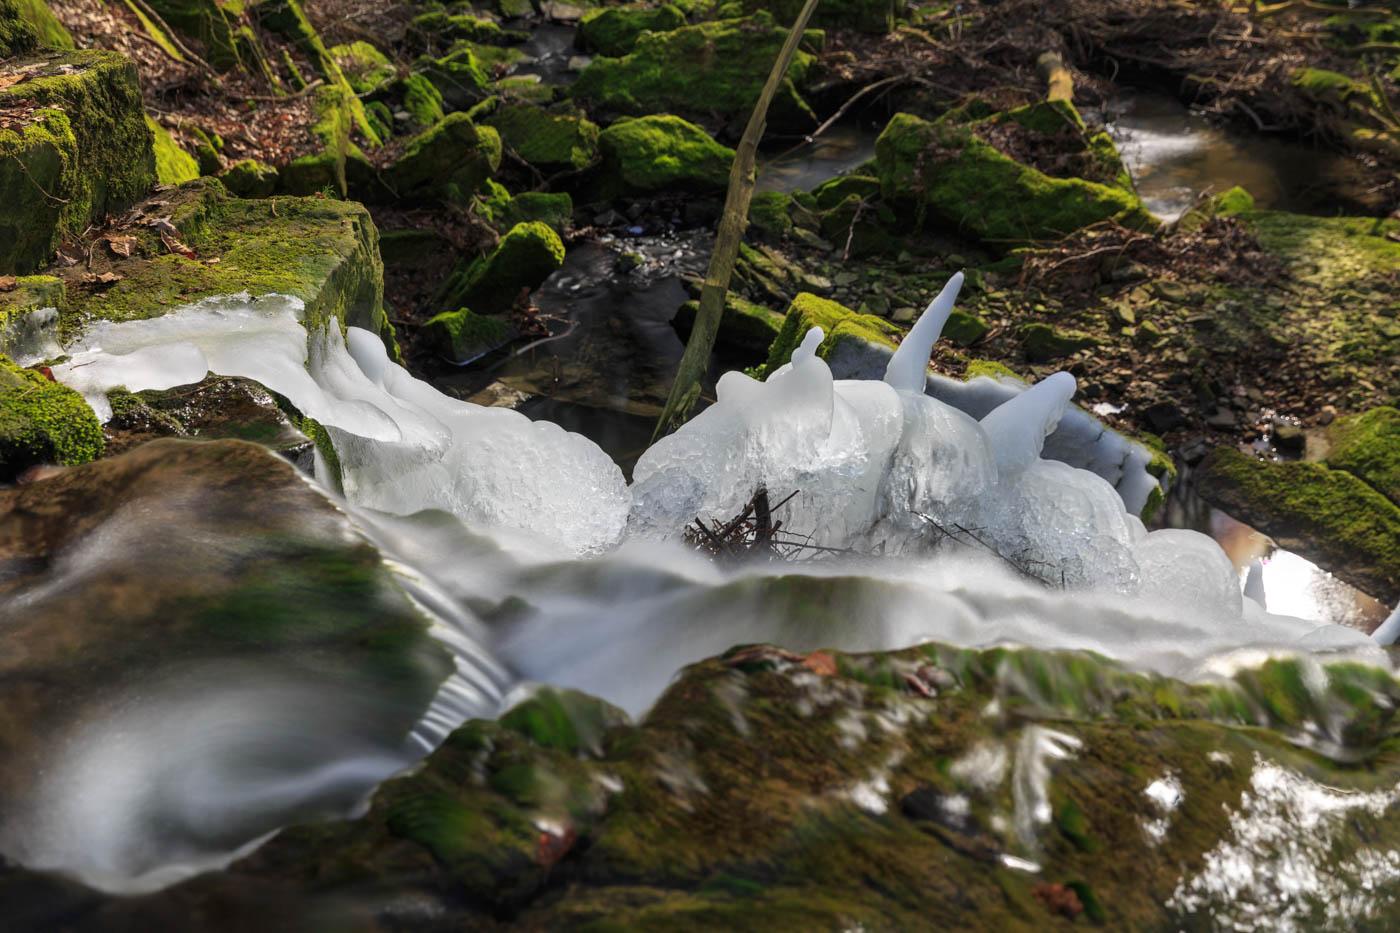 An den Keuperstufen des Föllbach hingen noch Eisreste wie fantastische Skulpturen, Wasserfall